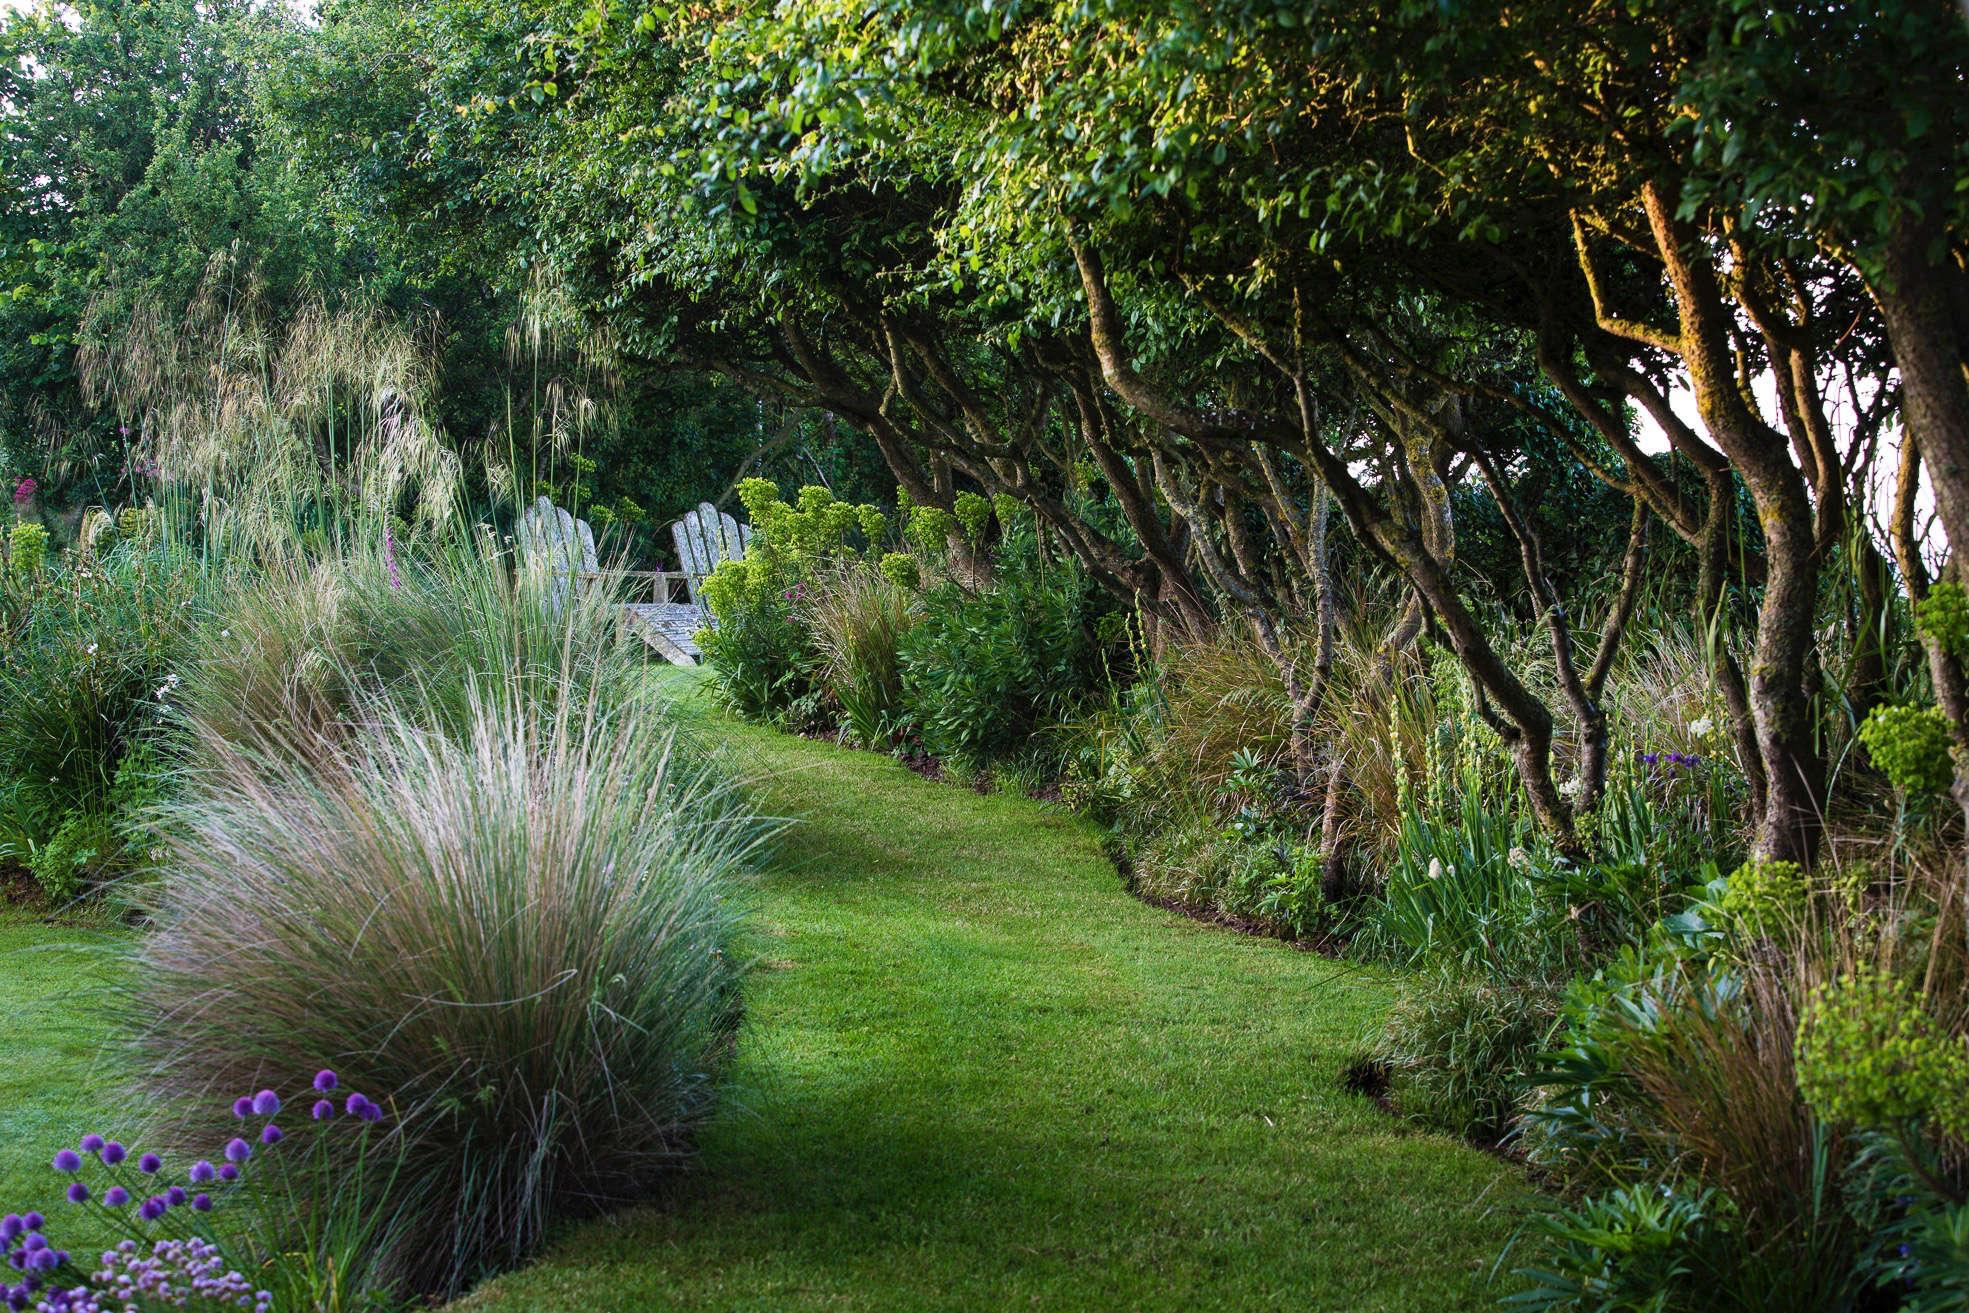 windy-devon-garden-grasses-trees-turf-lawn-clare-takacs-8